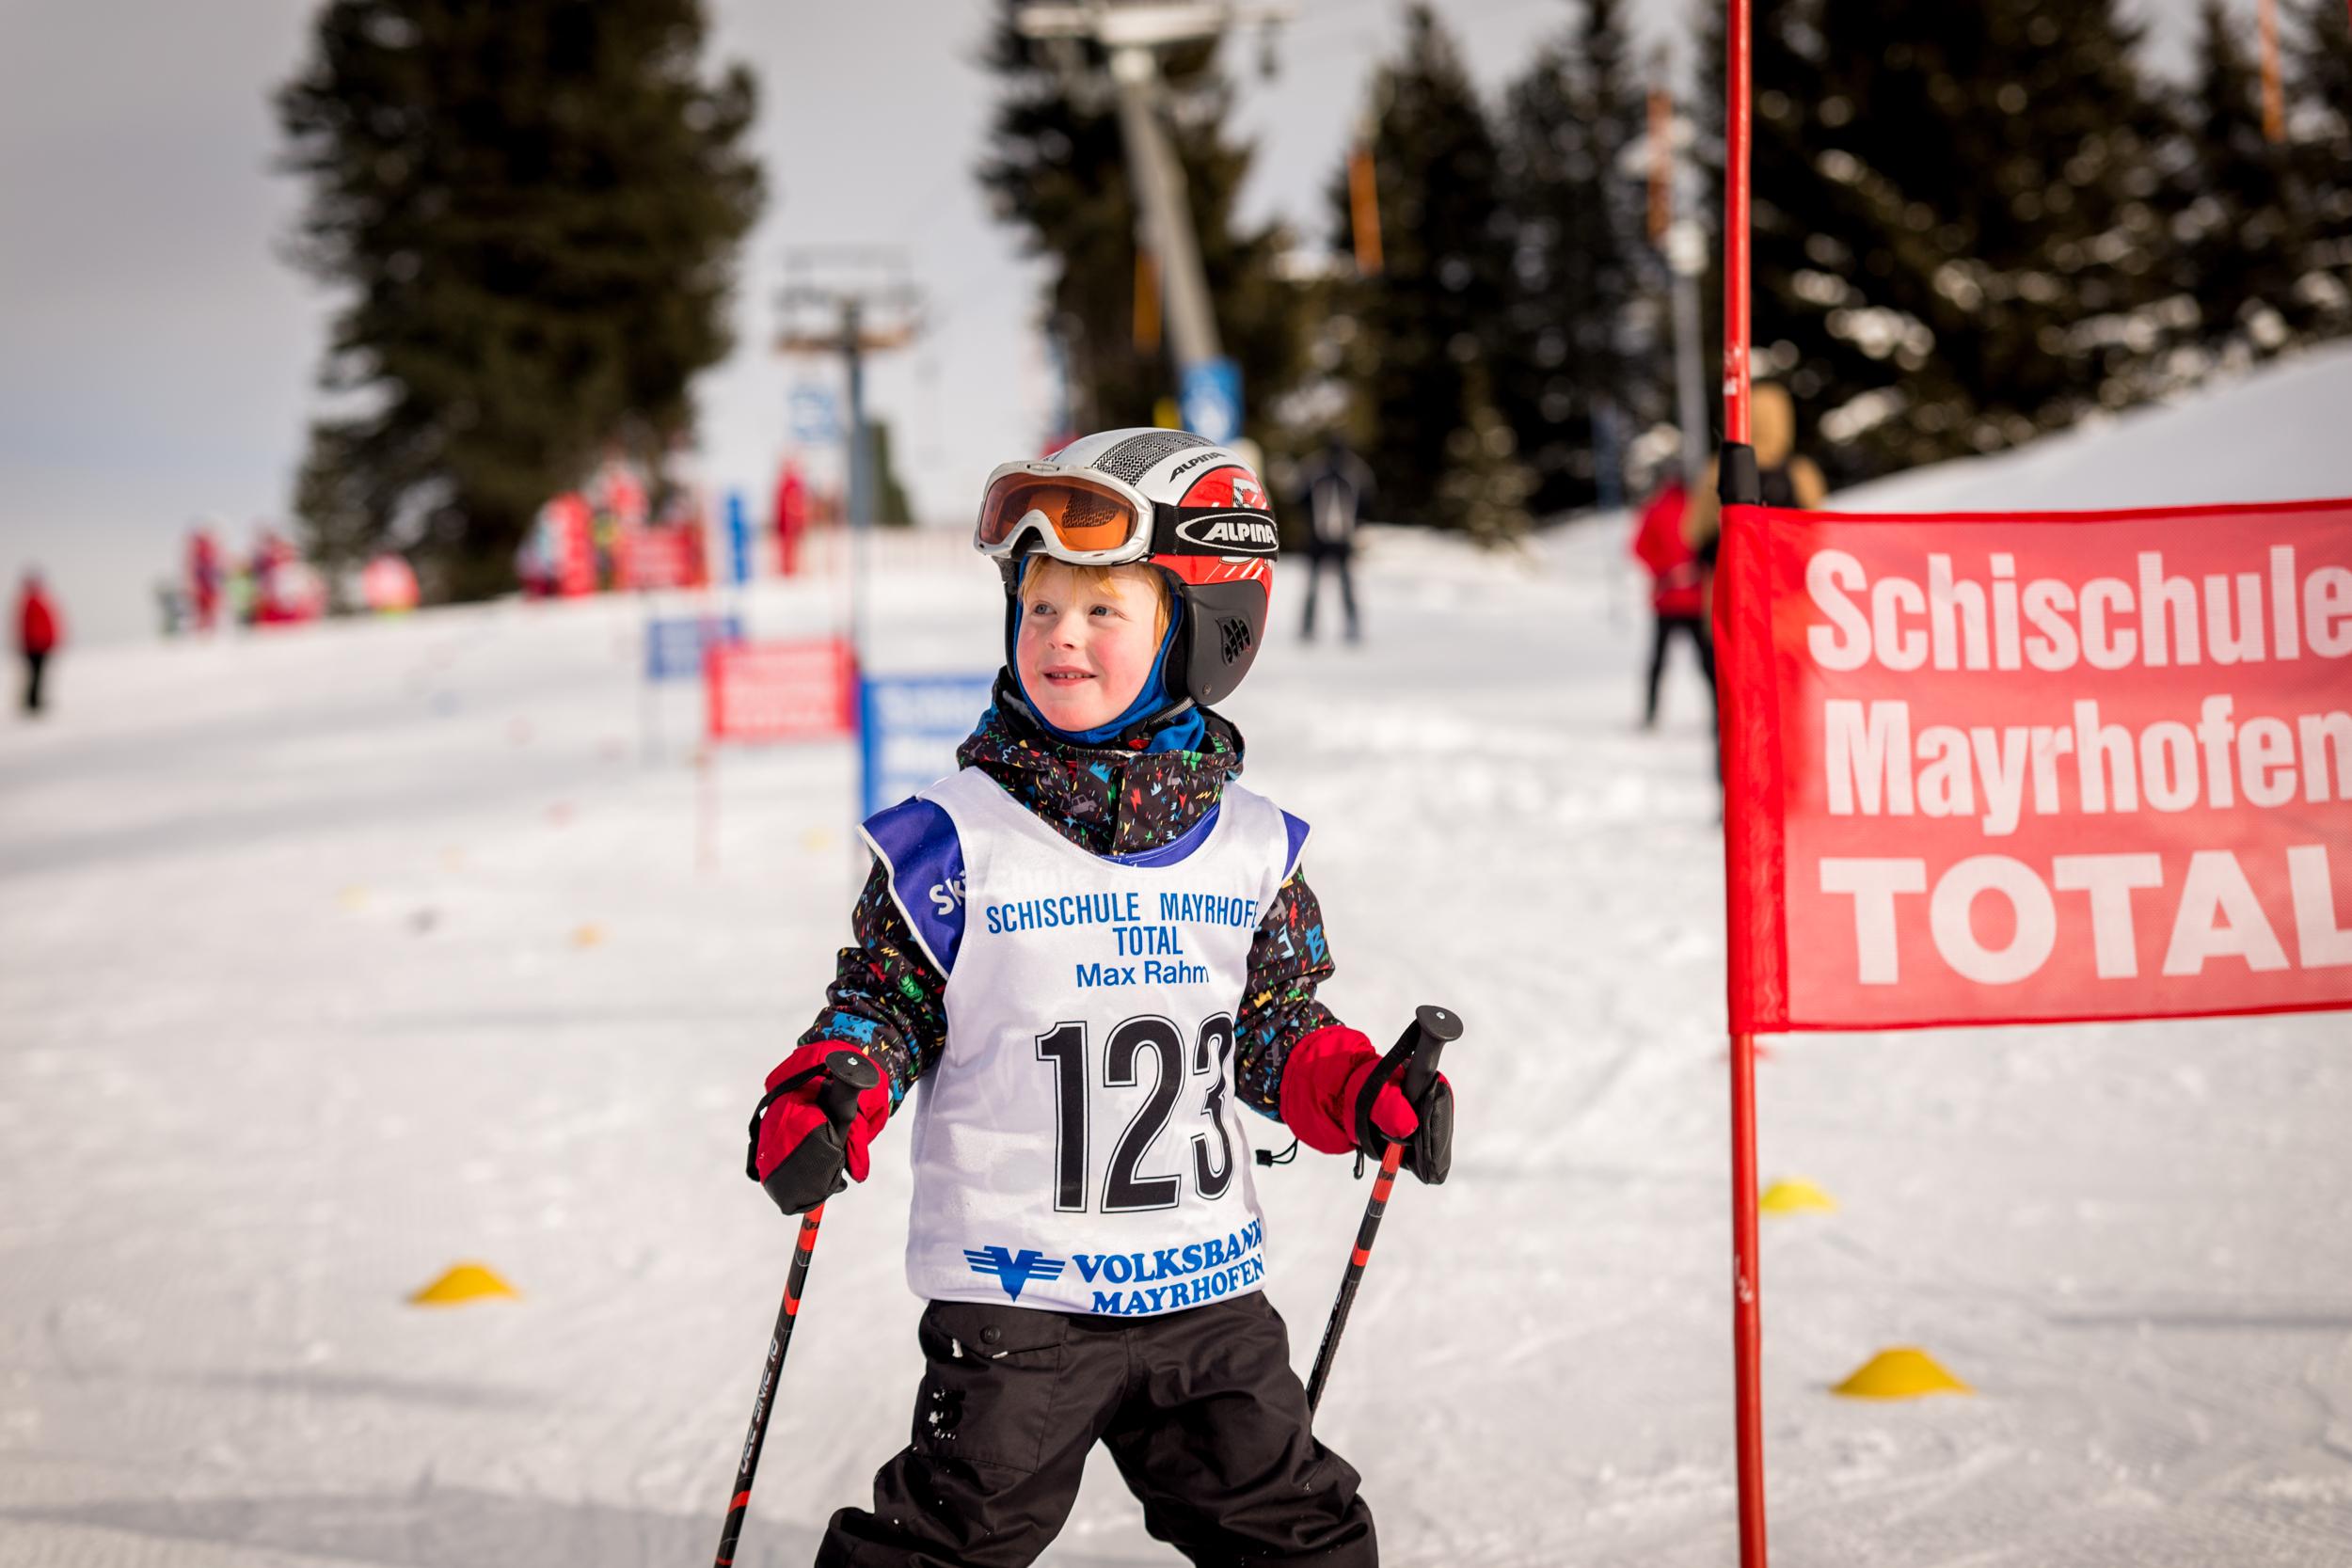 ski race 16_0089.jpg